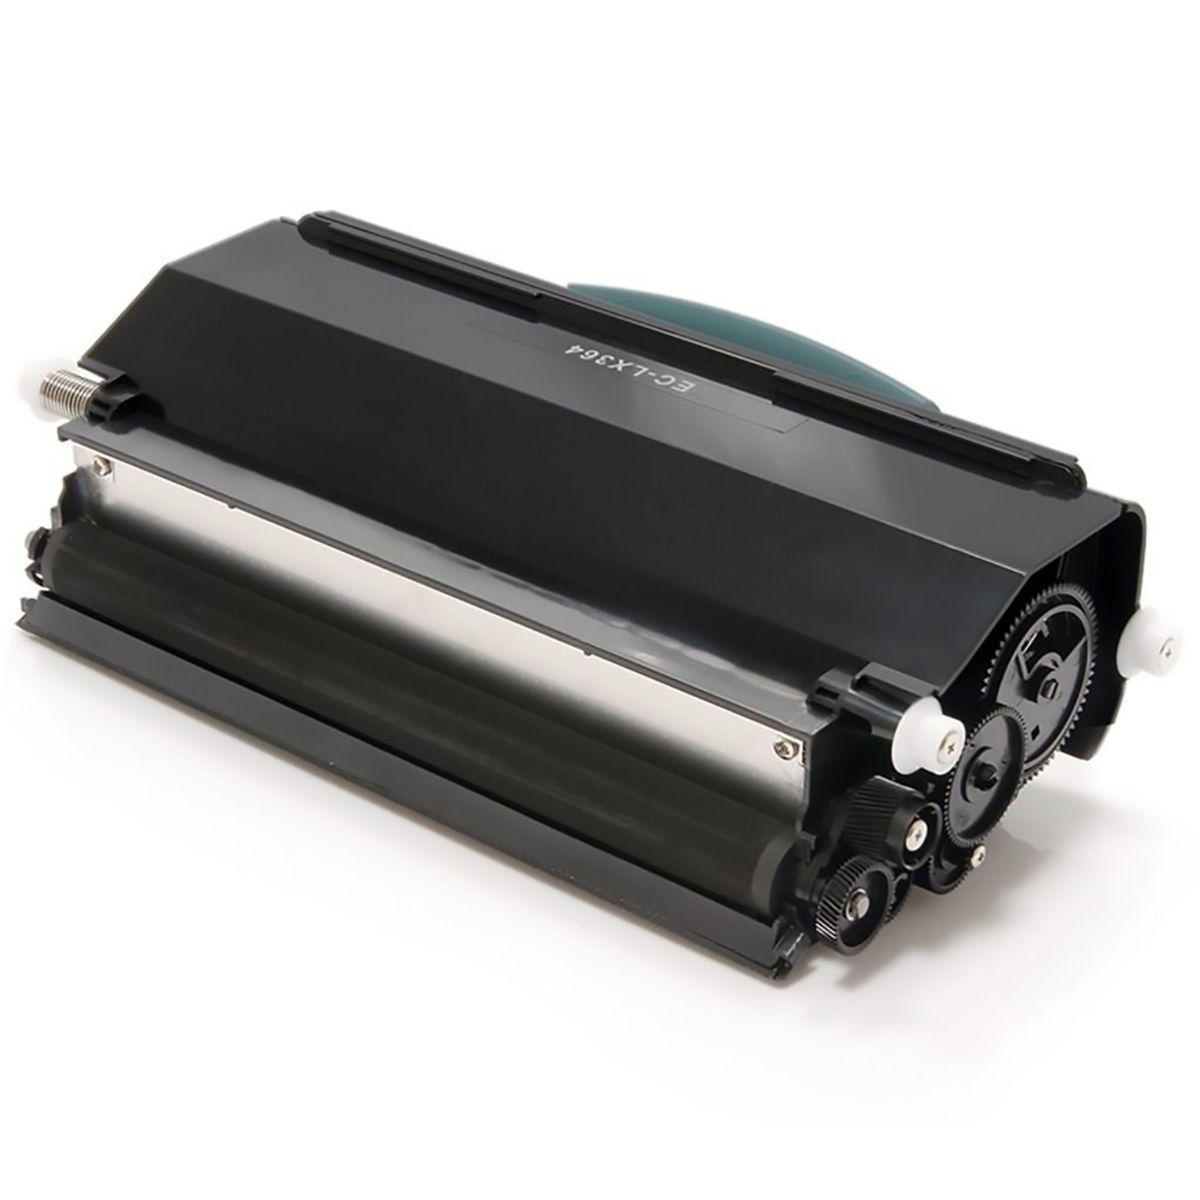 Compatível: Toner X264 para Lexmark X264dn X363 X363dn X363dw X364 X364dn X364dw 264dn 363dw 364dw / Preto / 9.000